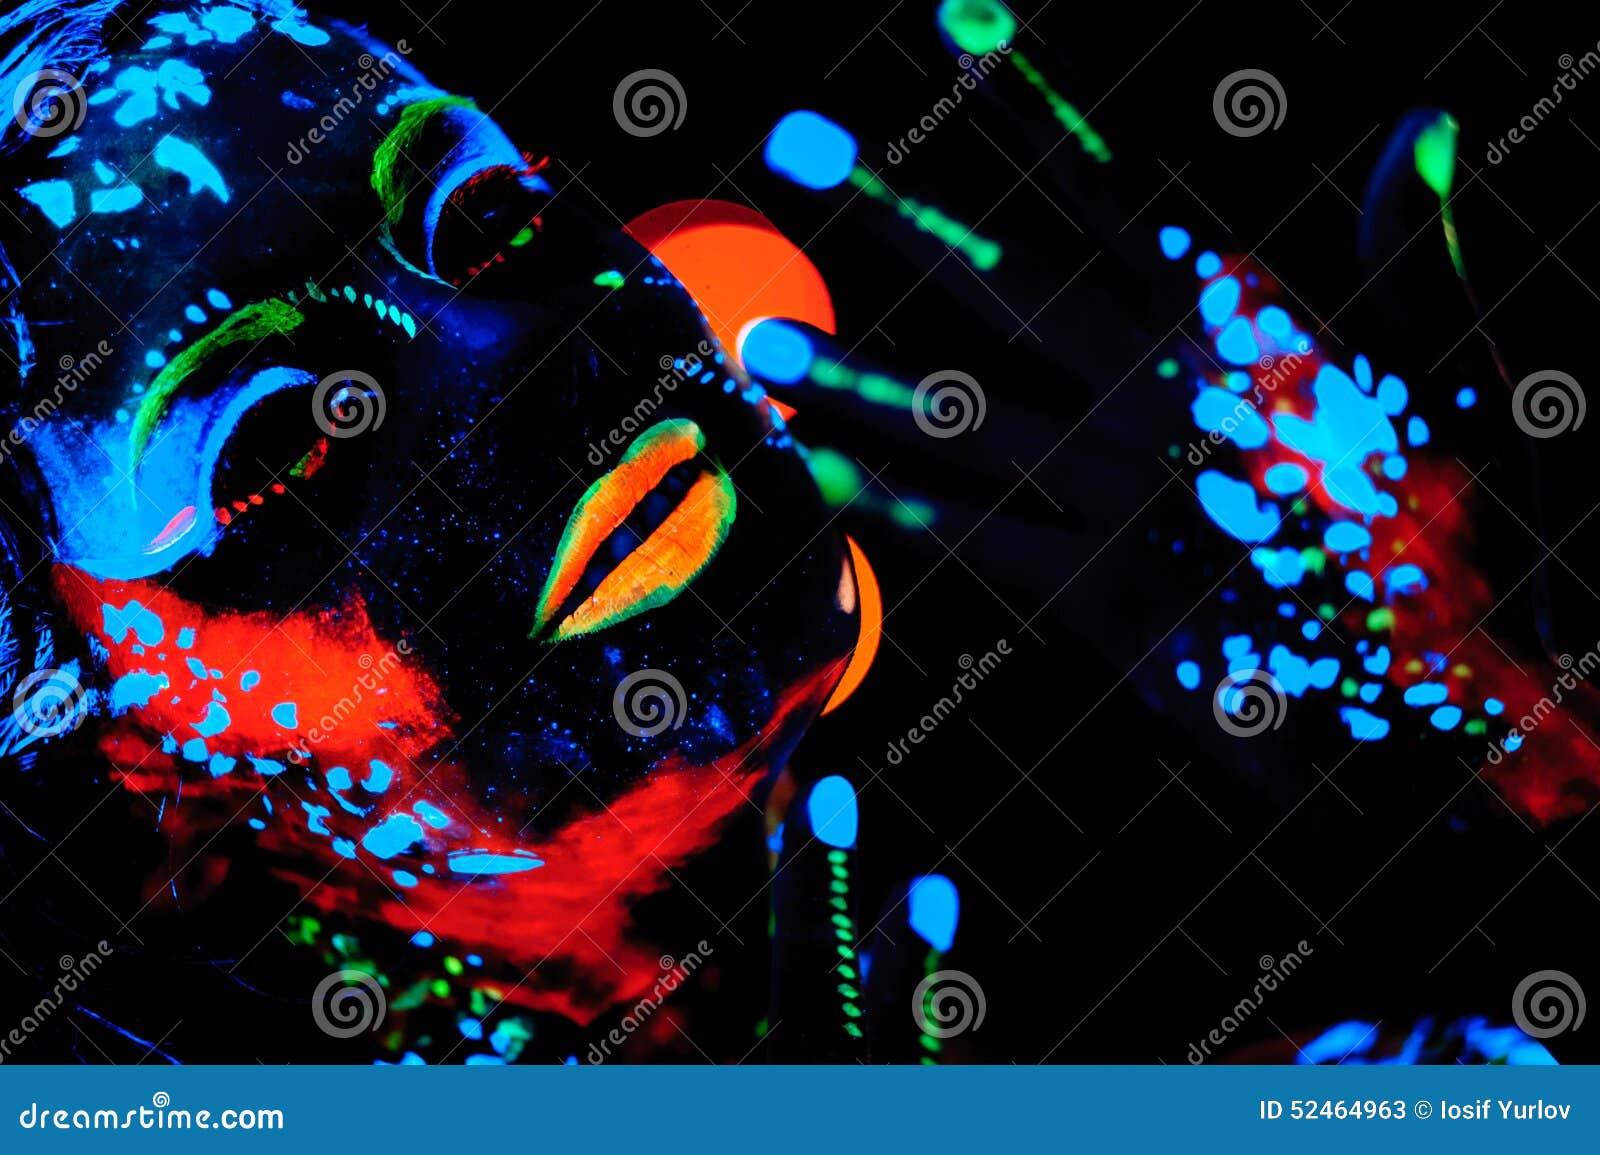 Image Gallery neon paint art